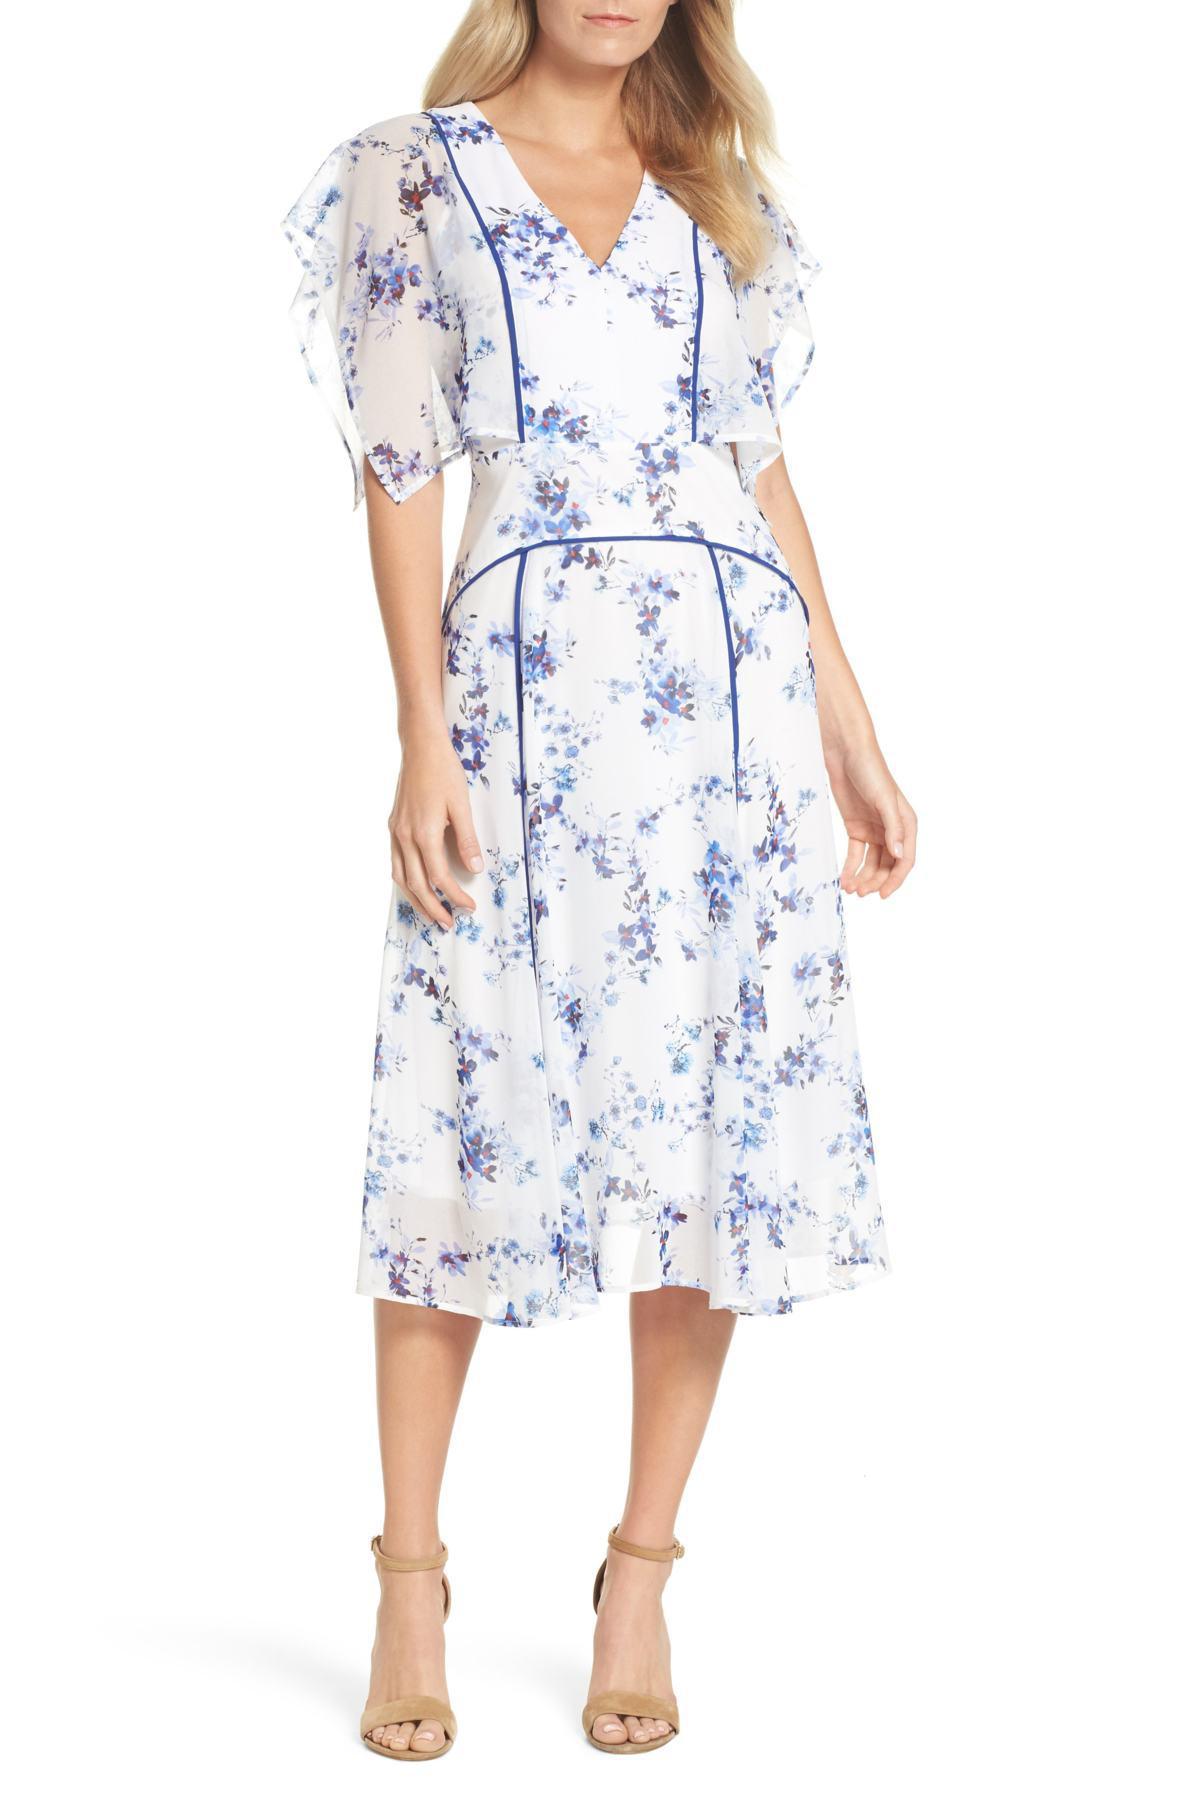 808253e90 Chelsea28 Floral Flutter Sleeve Midi Dress in Blue - Lyst